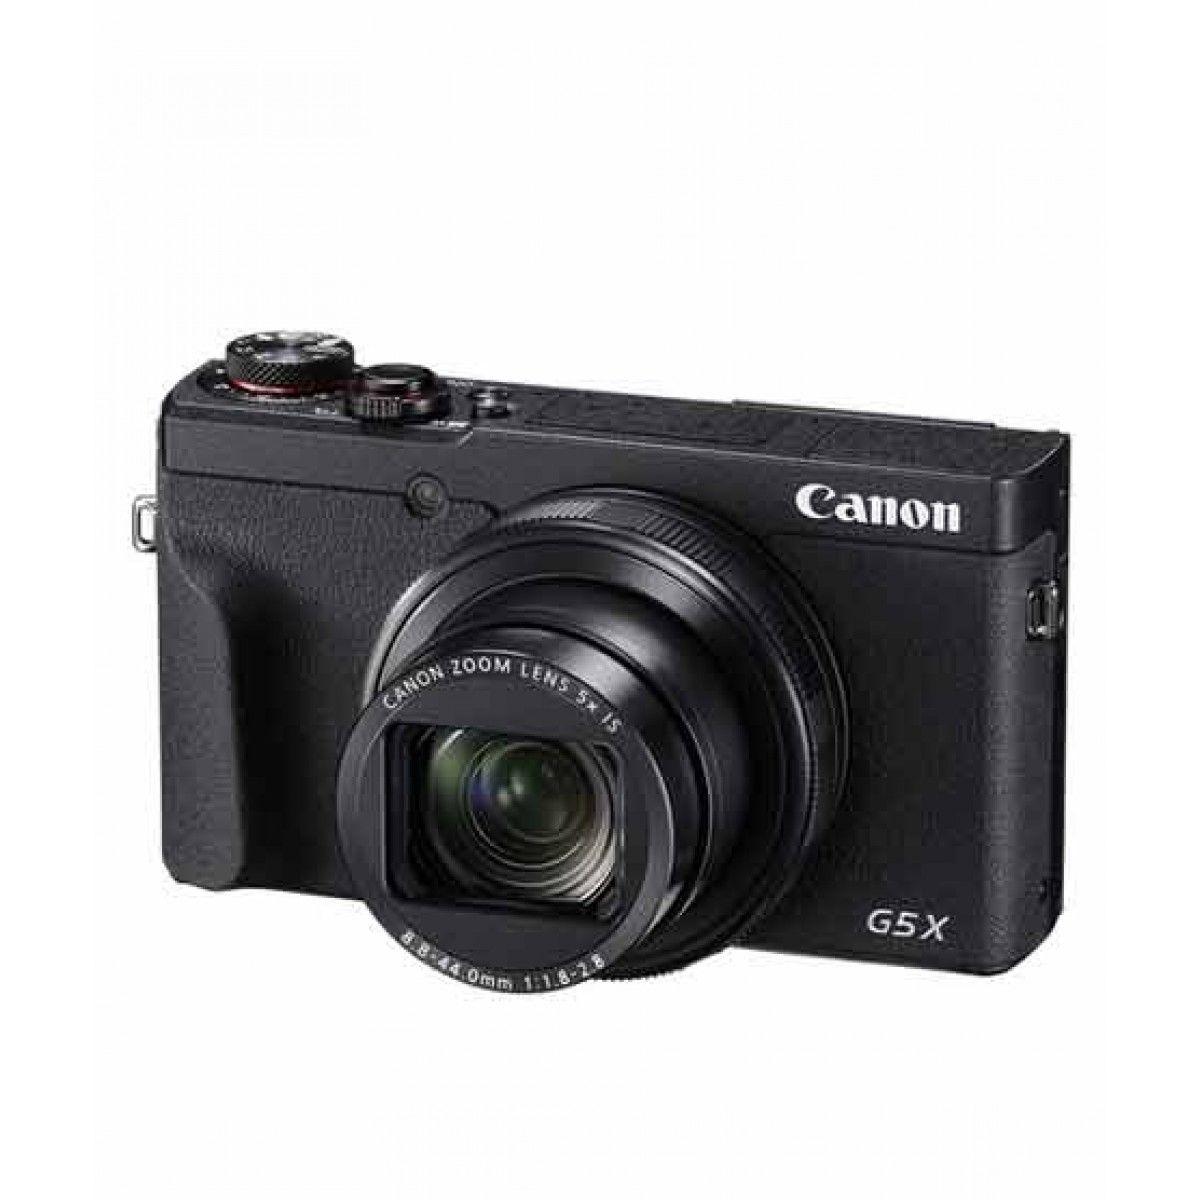 Canon PowerShot G5 X Mark II Digital Camera Black